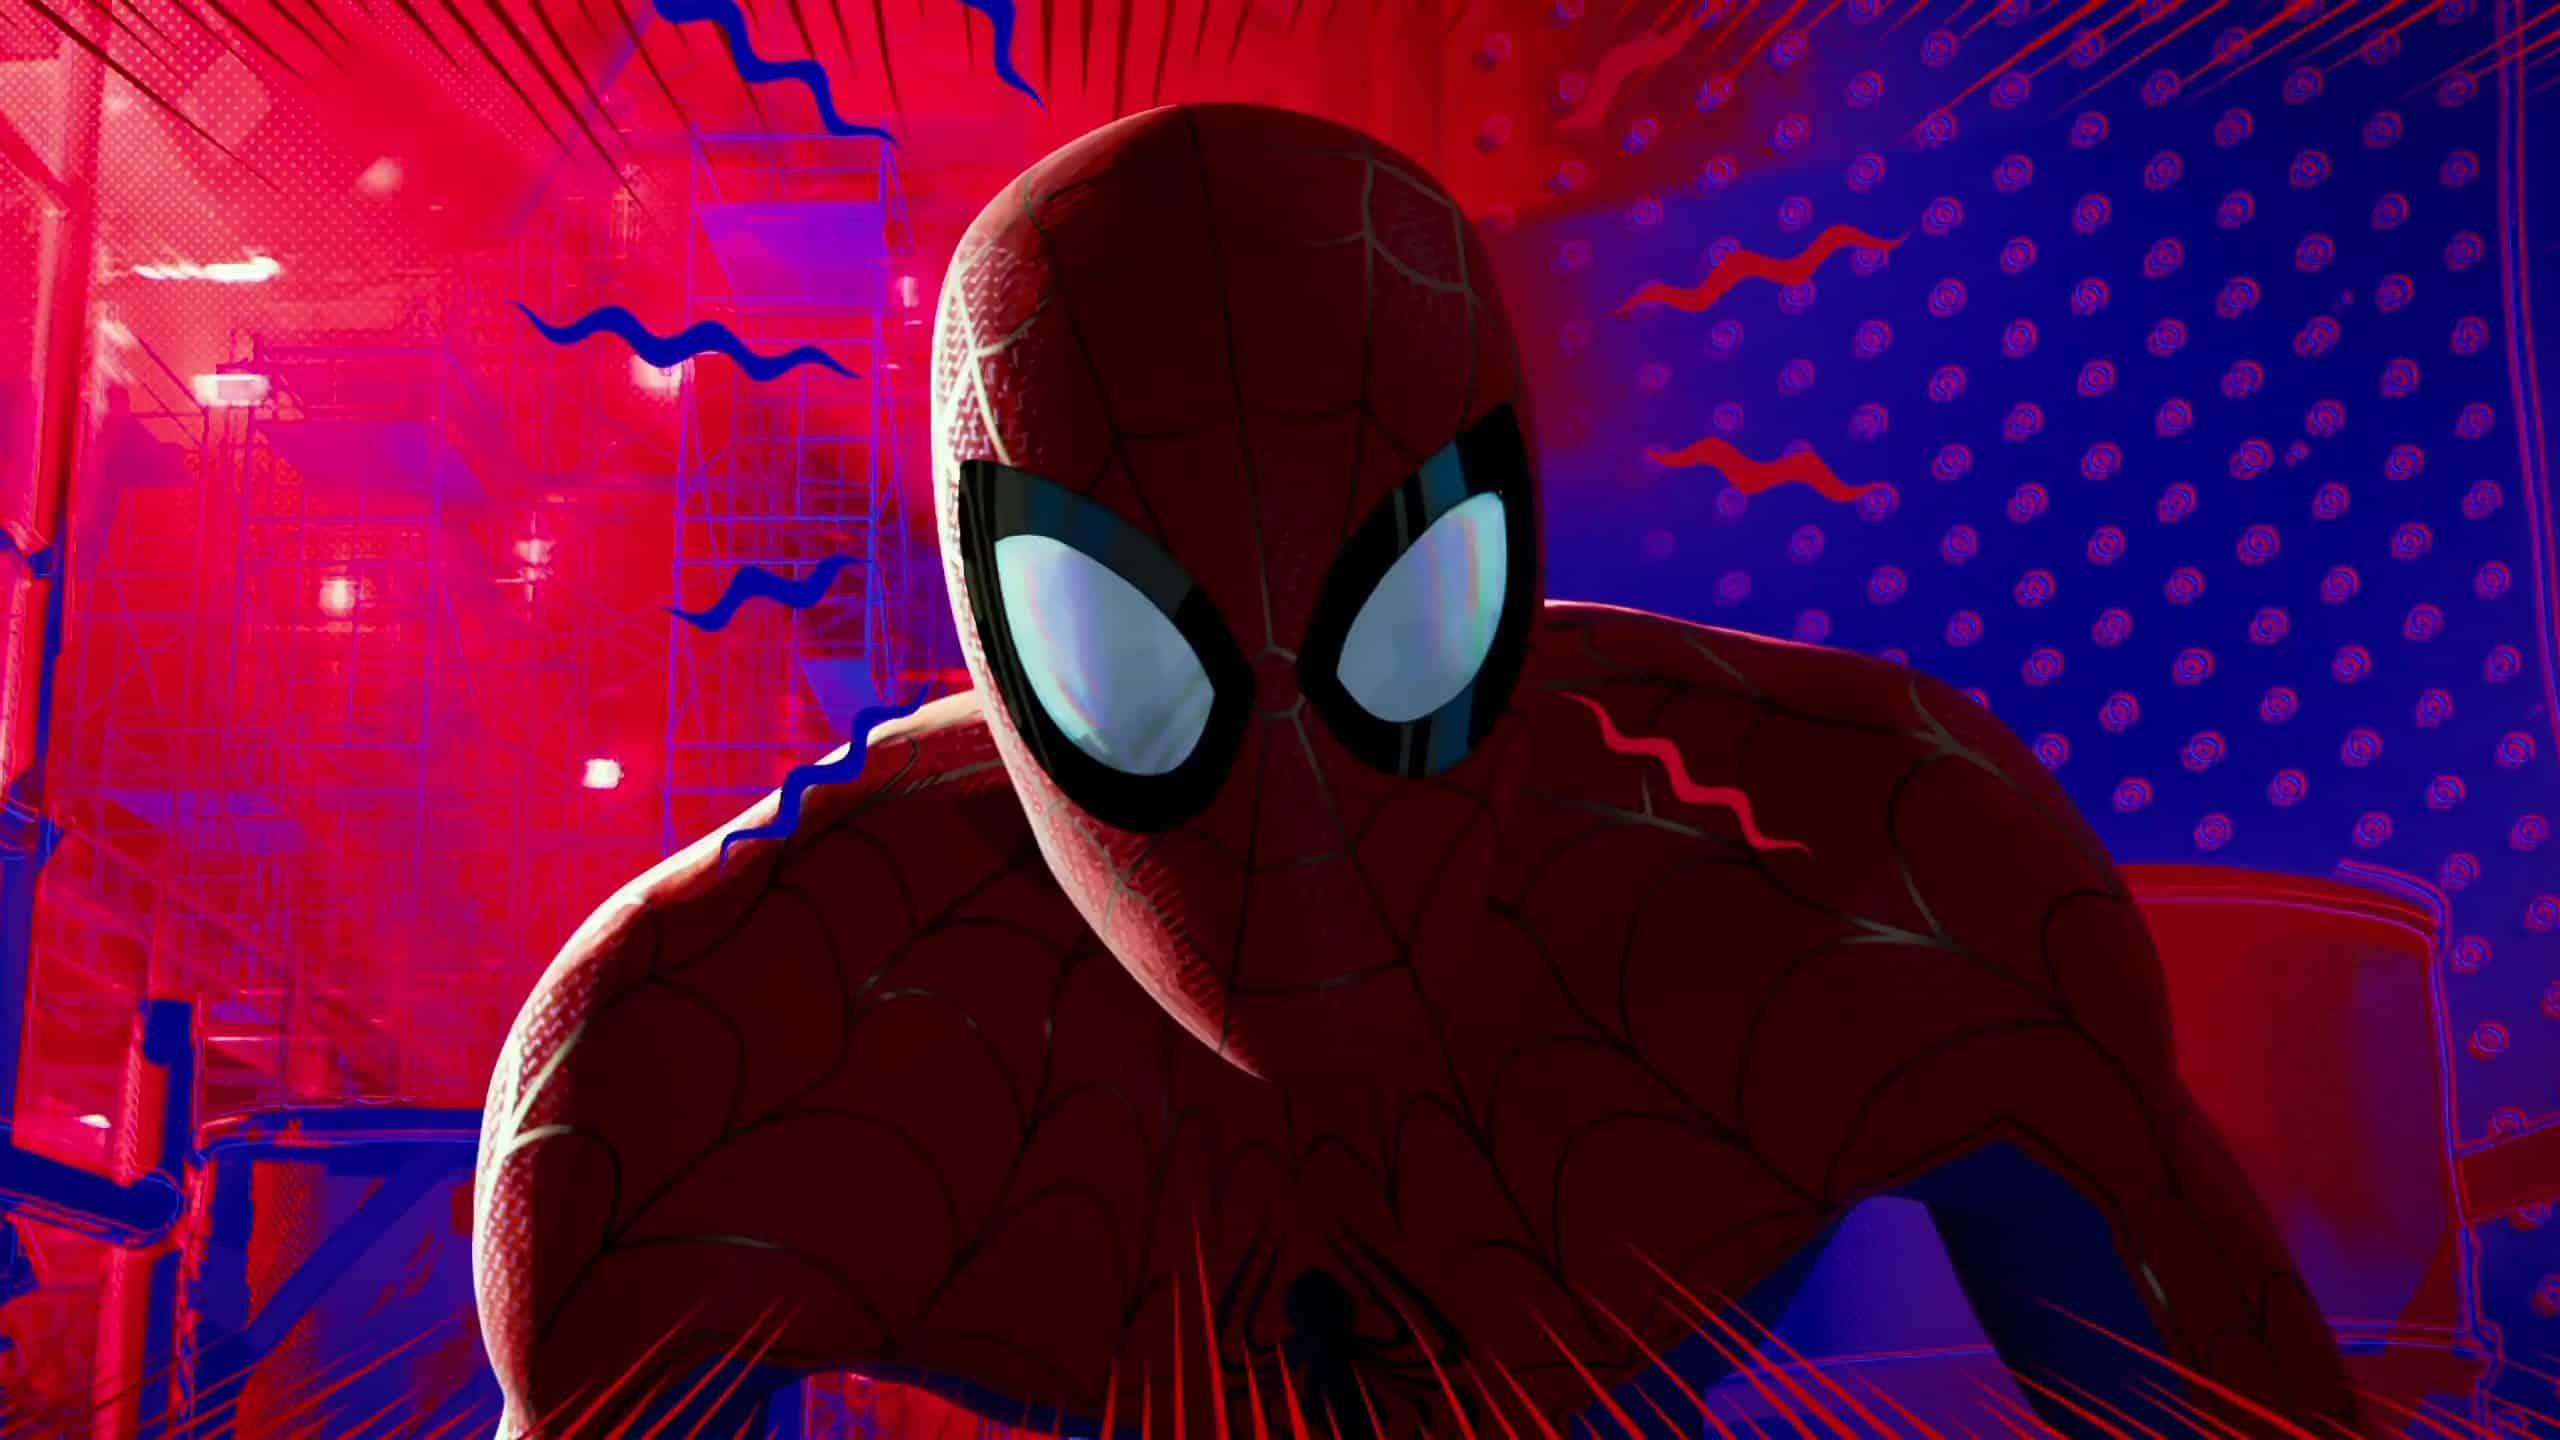 Spider man into the spider verse in theatres december 14 - New spiderman movie wallpaper ...